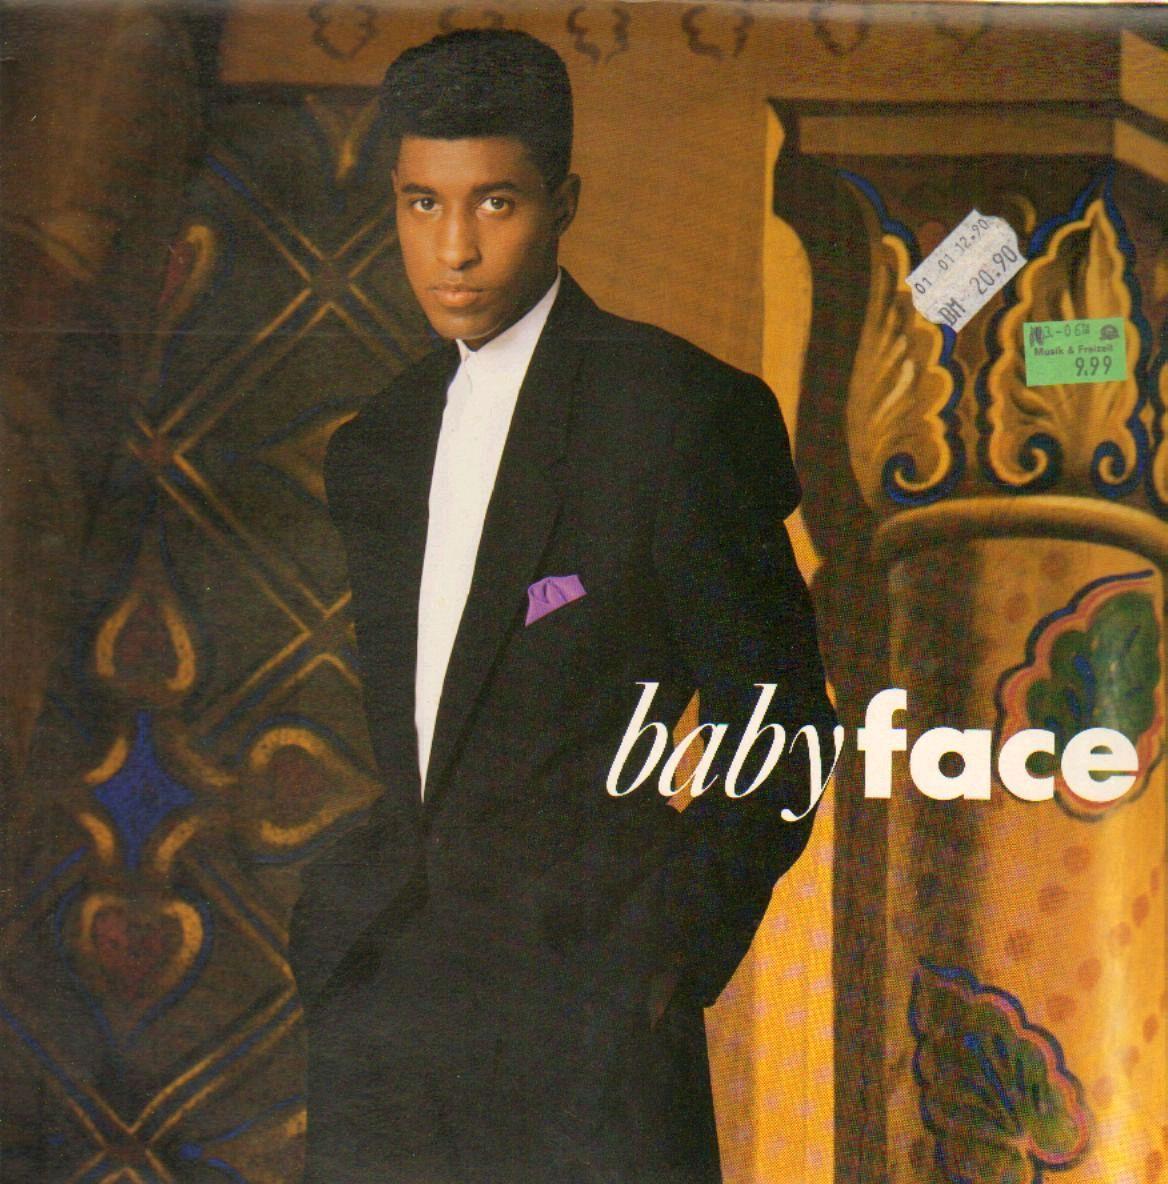 Babyface - Babyface